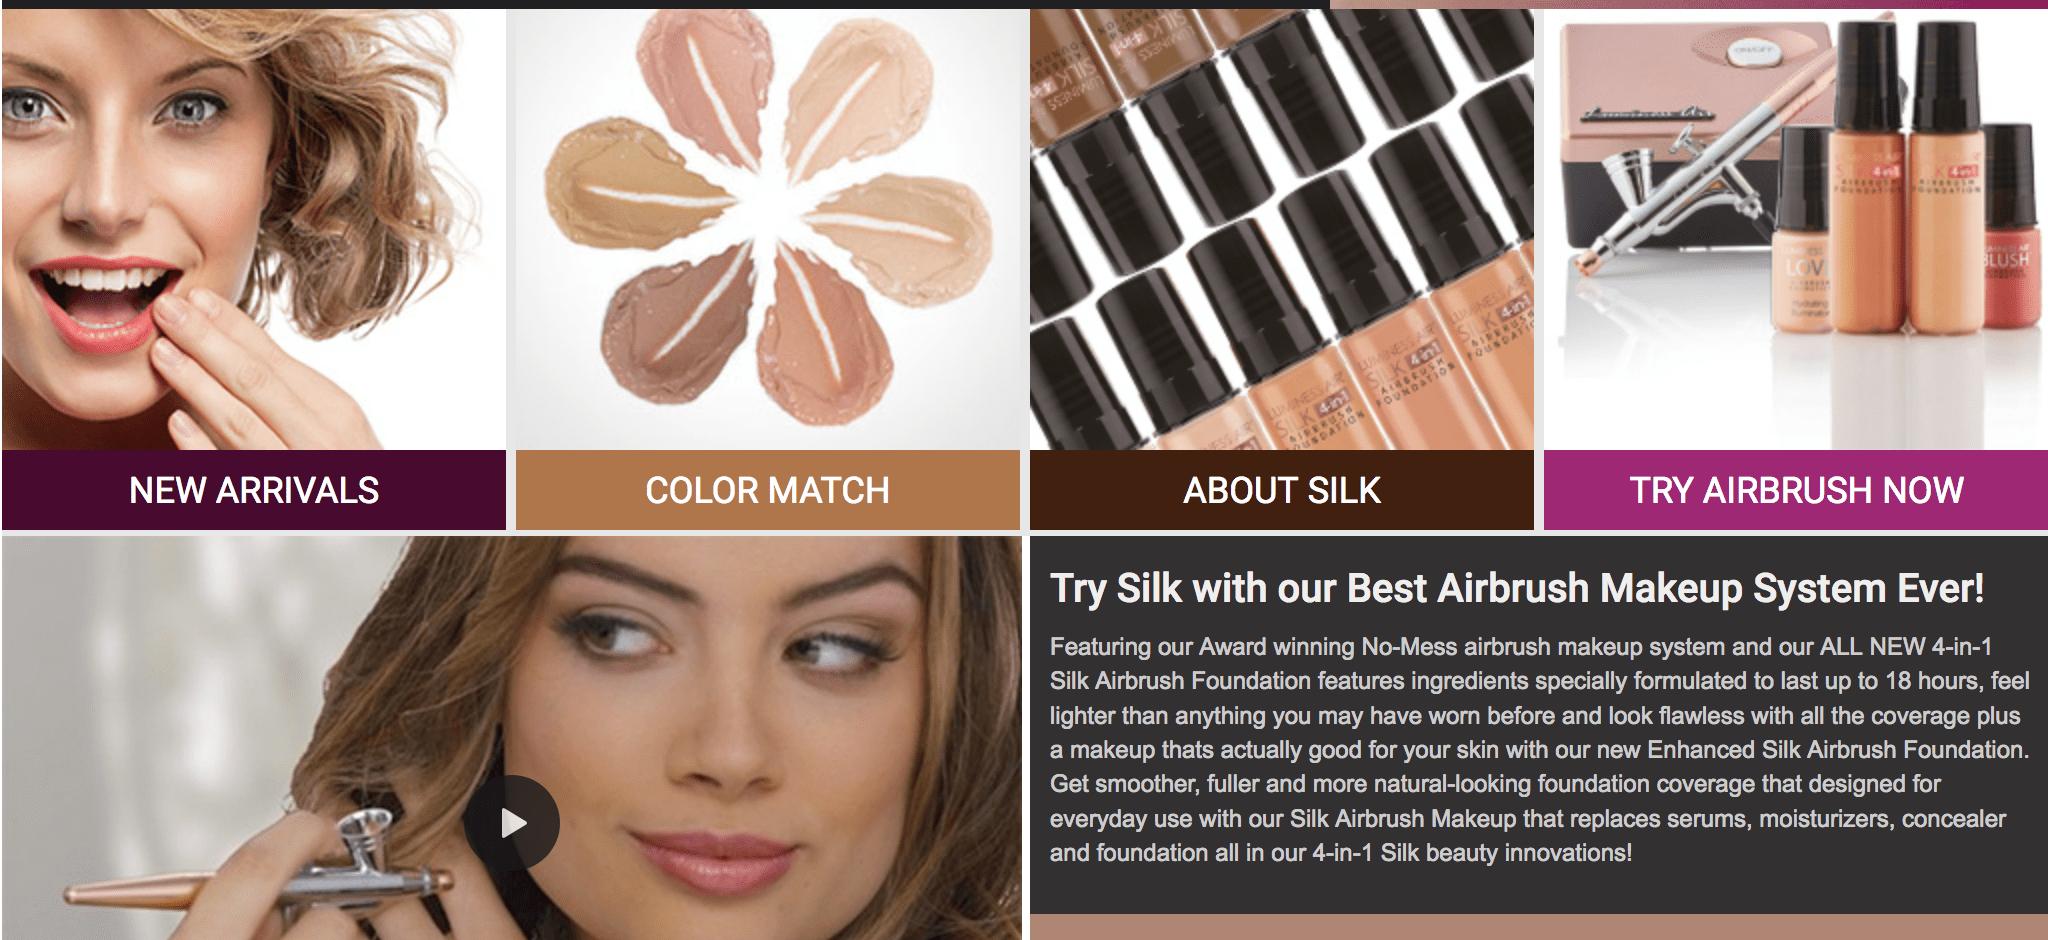 Luminess Air Reviews Airbrush makeup system, Airbrush